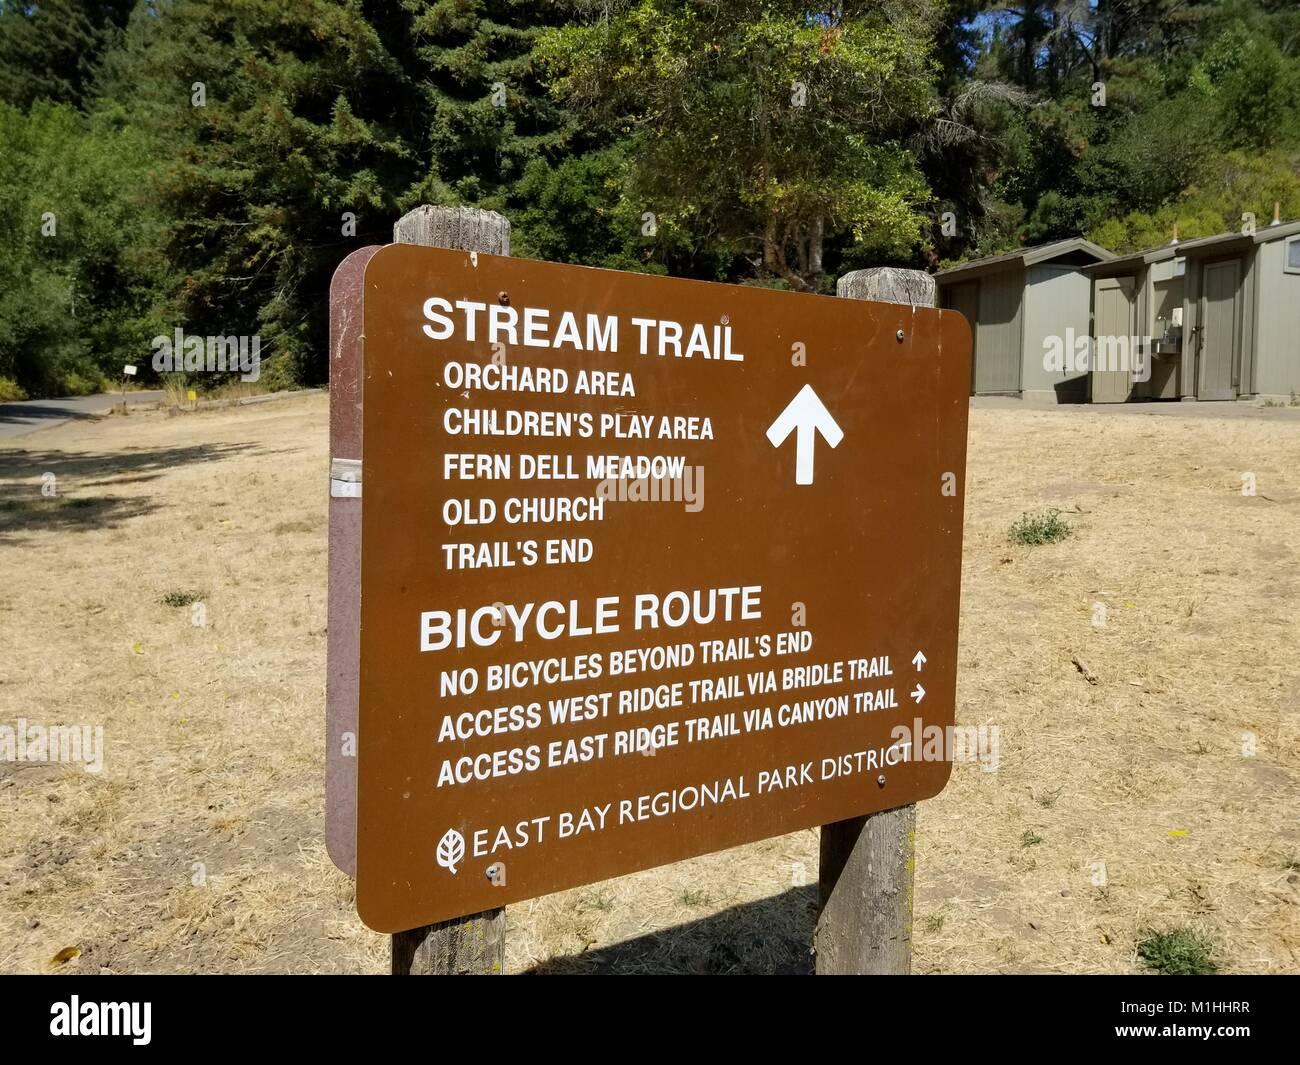 Sign for Stream Trail at Redwood Regional Park, an East Bay Regional Park in Oakland, California, September 5, 2017. - Stock Image